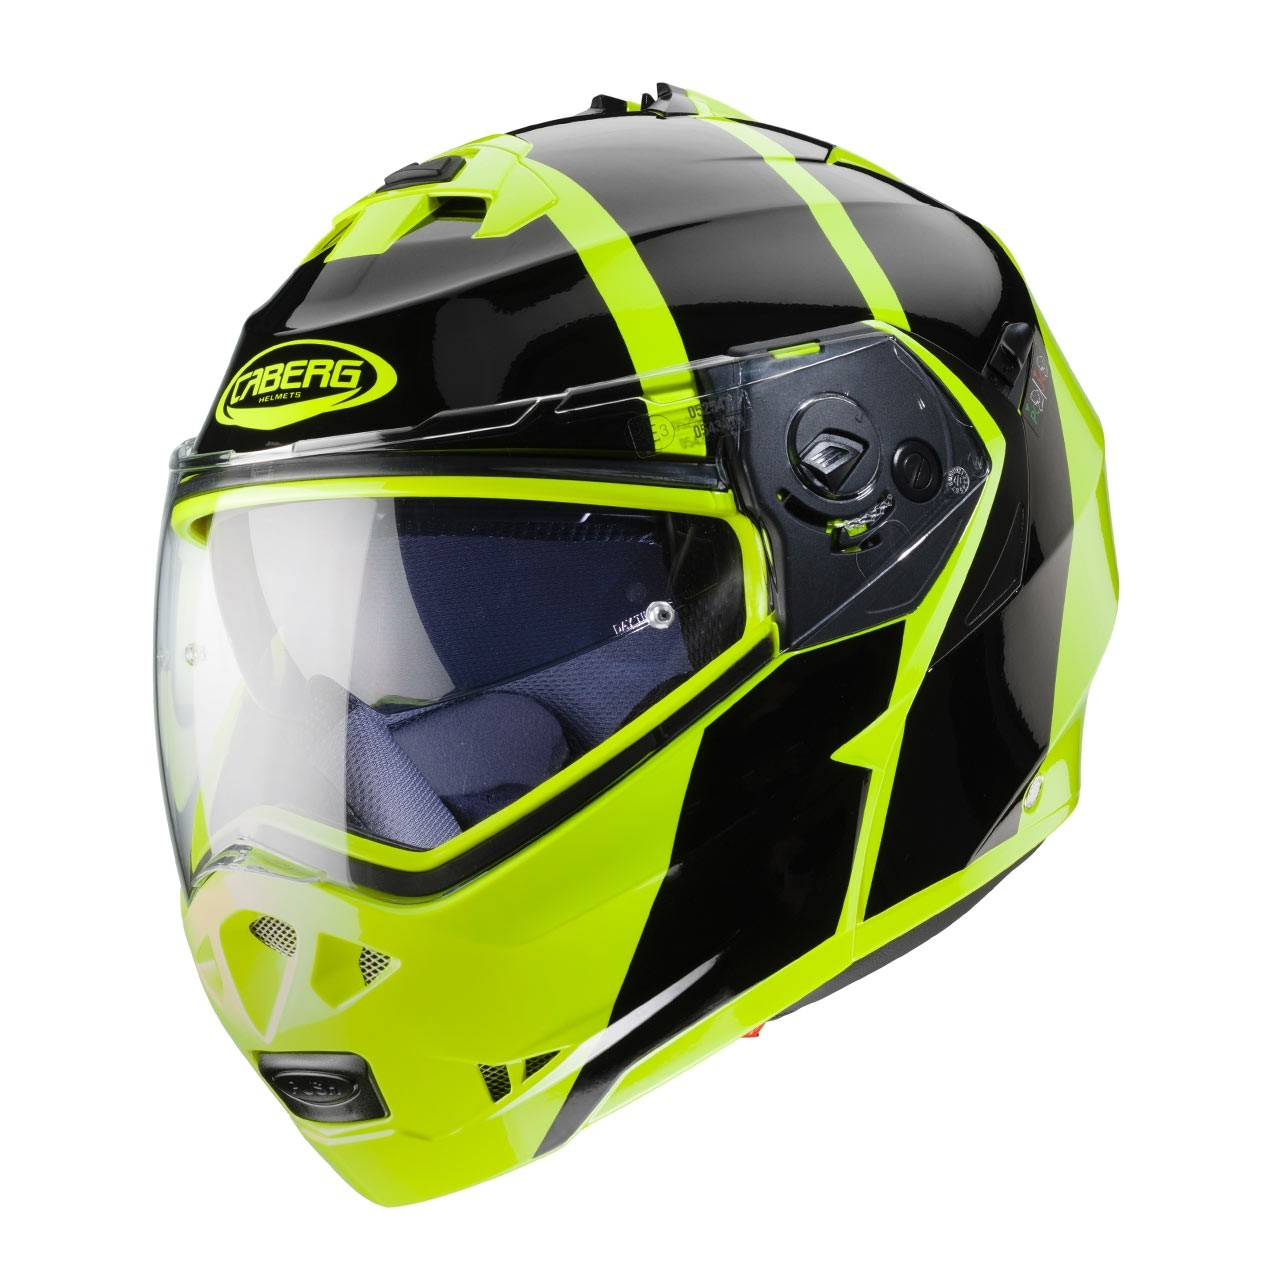 casco-caberg-duke-2-impact-amarillo-fluor-negro-34901406